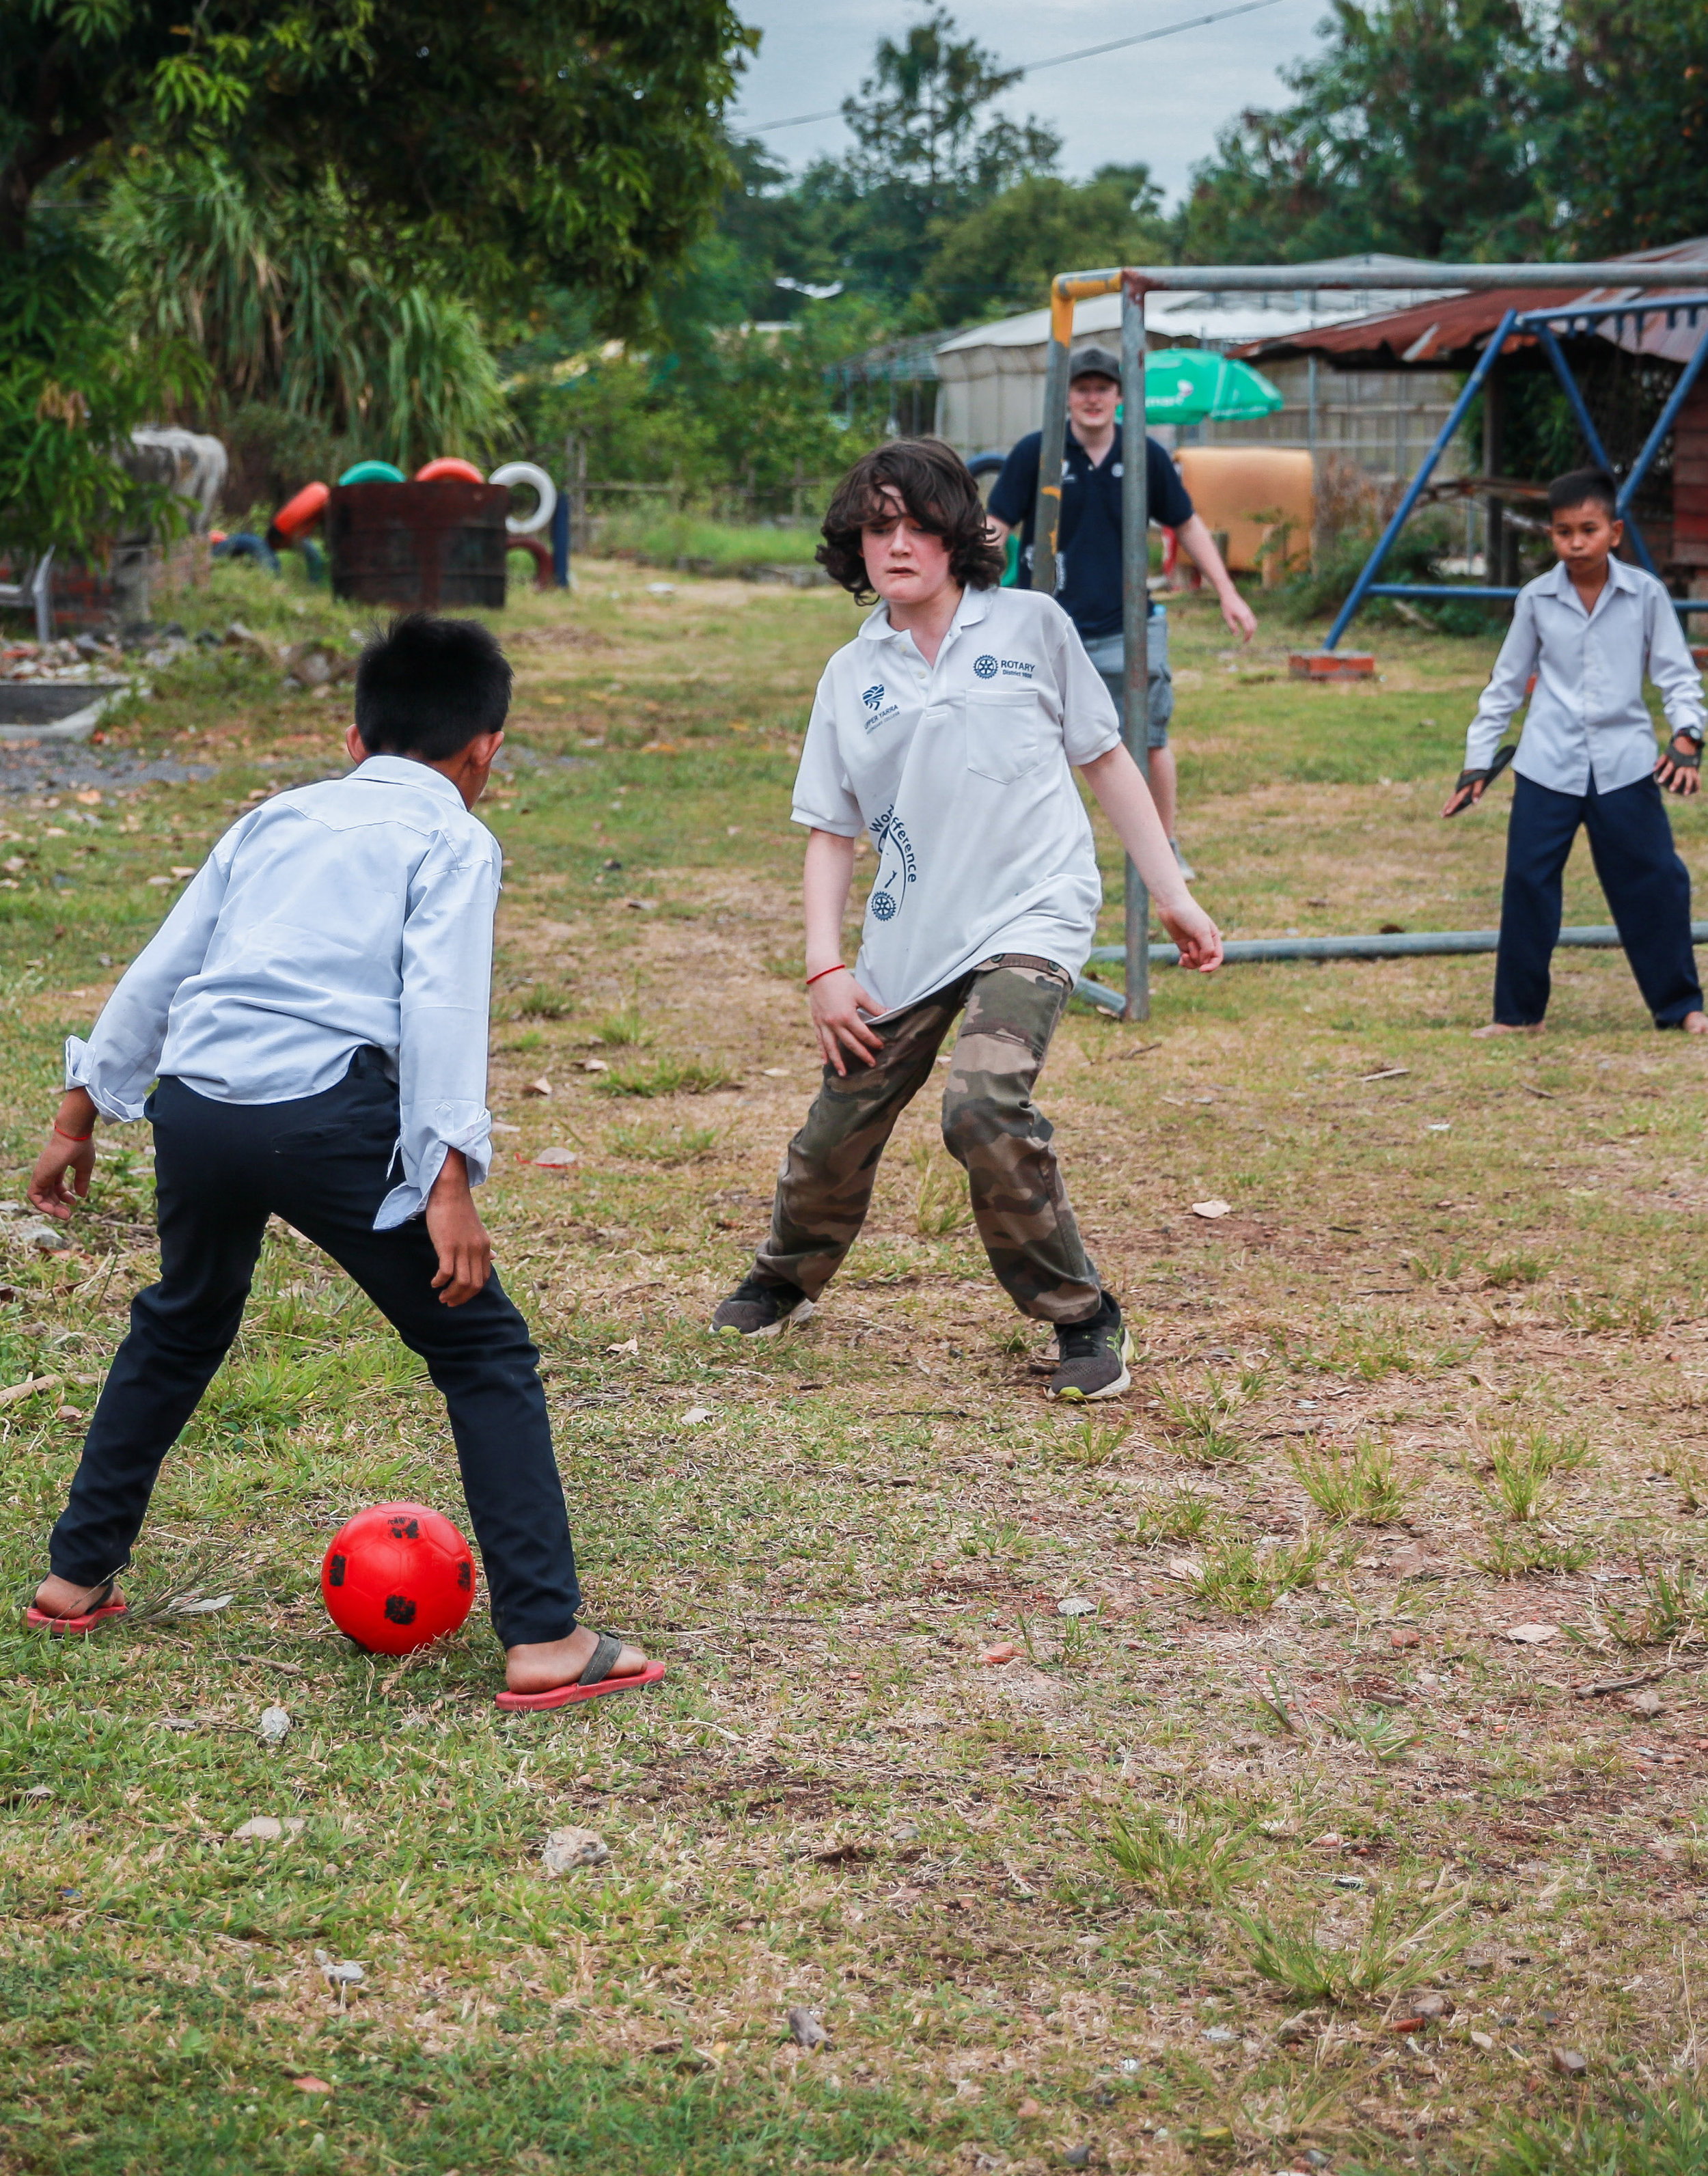 Enjoying a game of soccer.